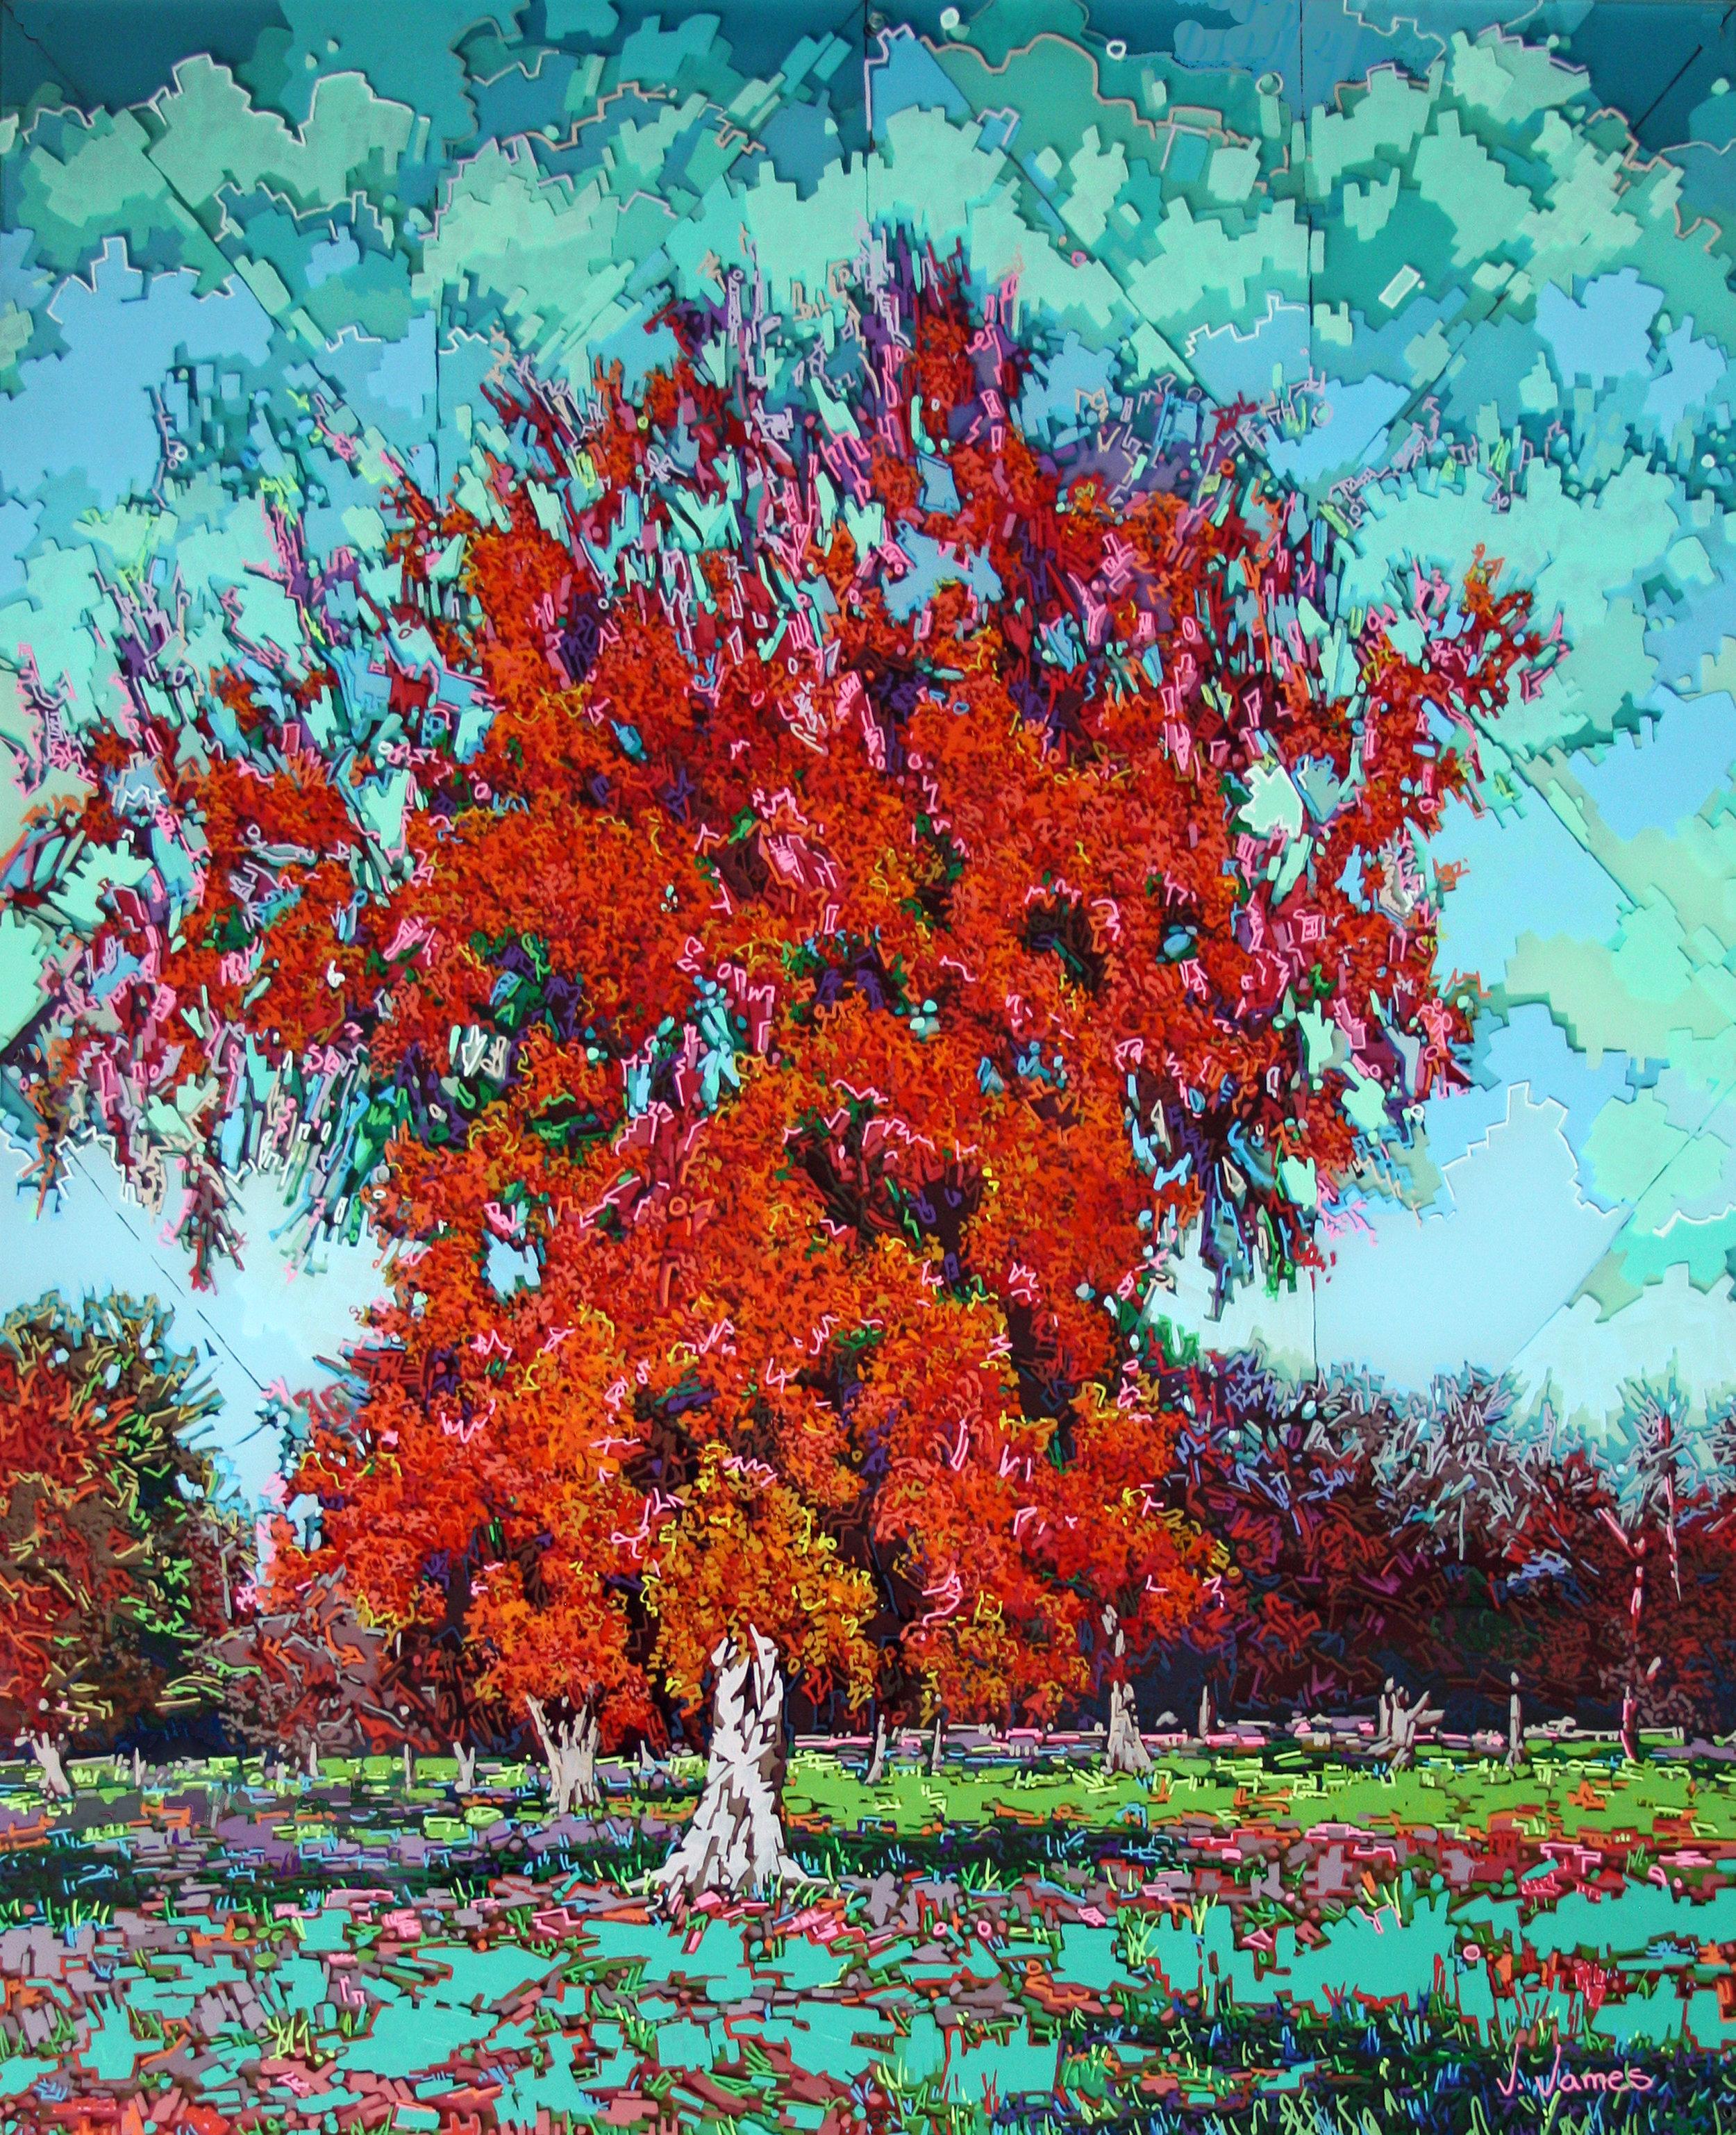 """Song Birds""©, 32"" x 26"" Acrylic on Multi-Panel Acrylic"